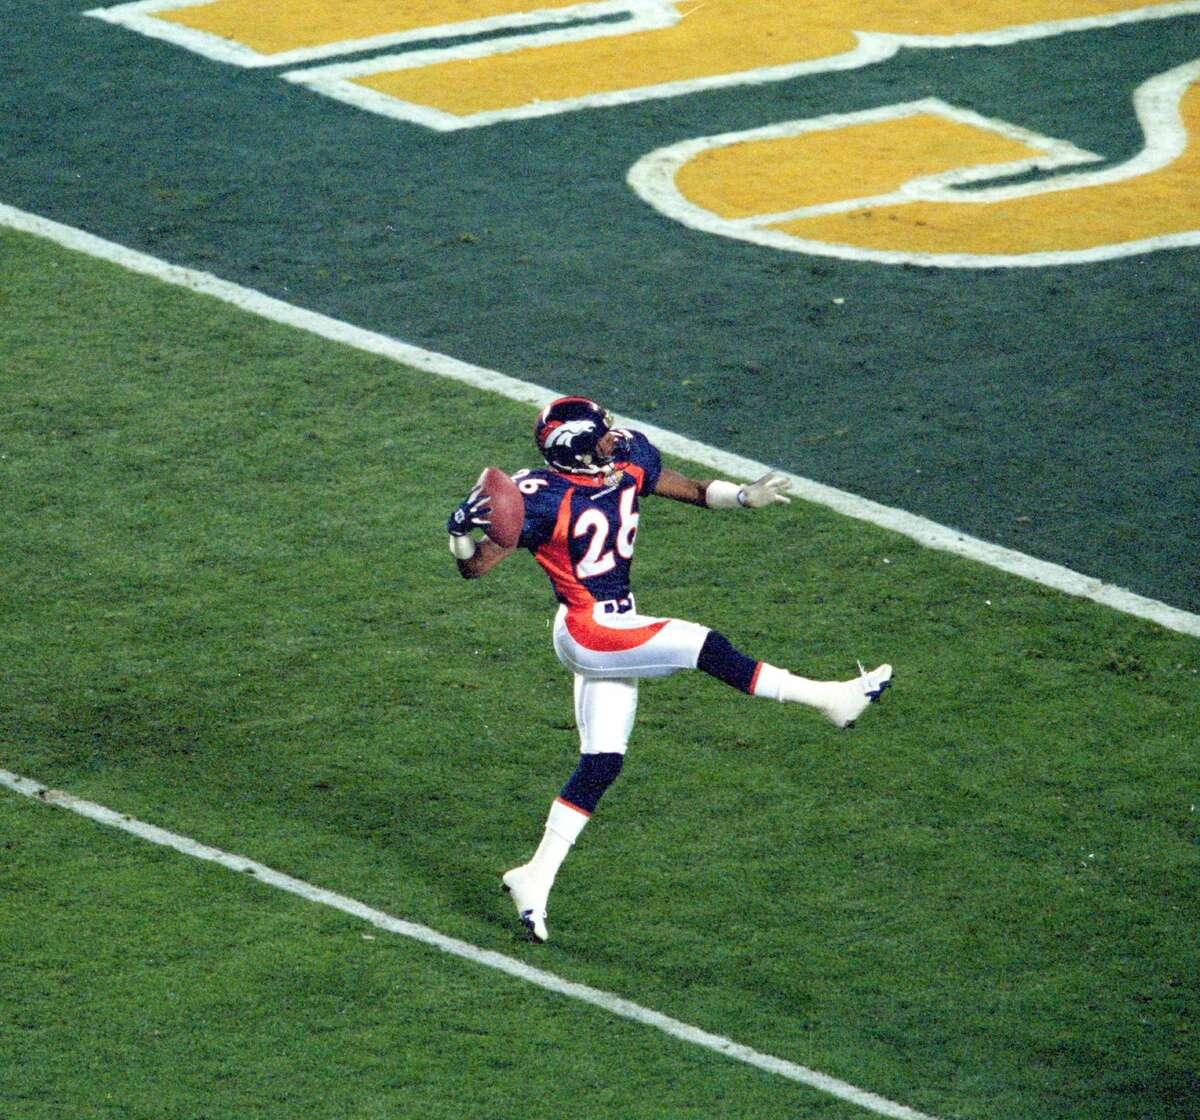 PORT ARTHUR LINCOLN (6) Jonathan Babineaux, DT, Falcons (Super Bowl LI) Jordan Babineaux, CB, Seahawks (Super Bowl XL) Tim McKyer, DB, 49ers, Broncos (Super Bowl XXIII, XXIV, XXXII) Joe Washington, RB, Washington (Super Bowl XVII, XVIII) Bobby Leopold, LB, 49ers (Super Bowl XVI) Aaron Brown, DE, Chiefs (Super Bowl I, IV)